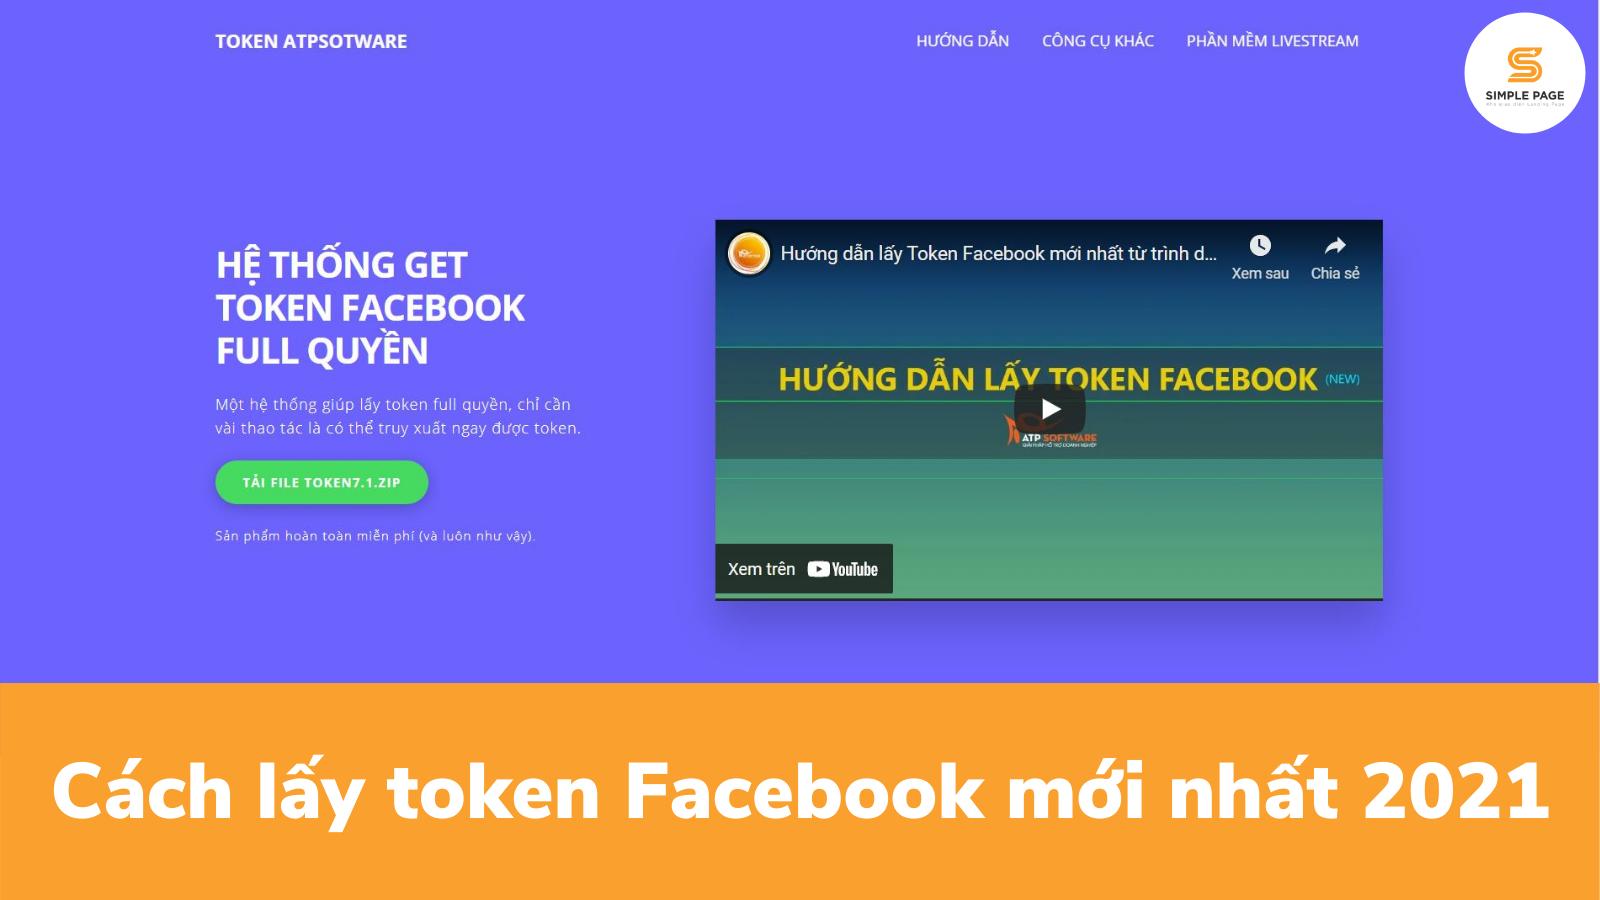 Cách lấy token Facebook mới nhất 2021 (1)